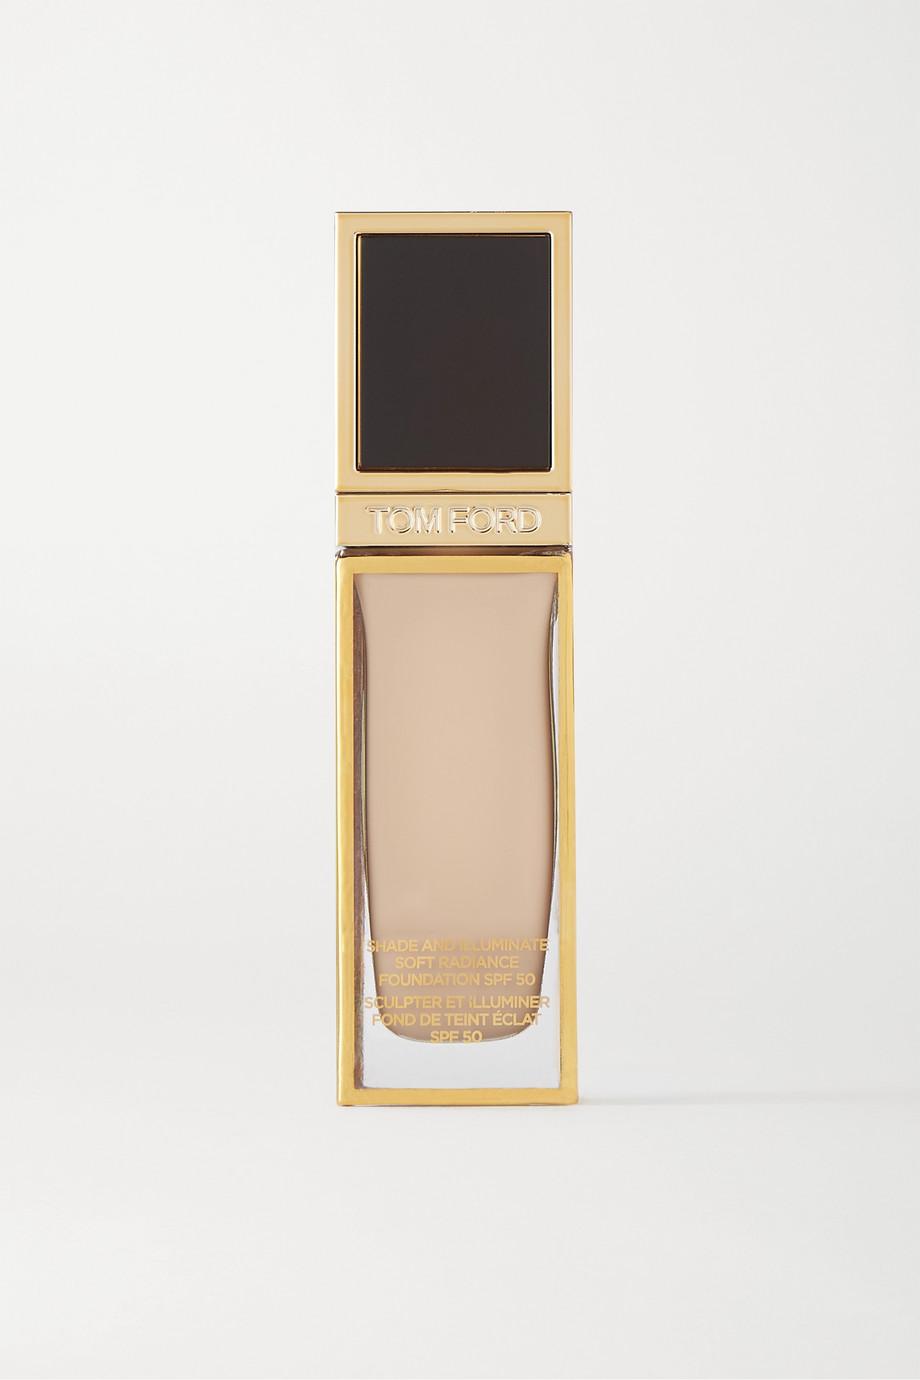 TOM FORD BEAUTY Shade and Illuminate Soft Radiance Foundation SPF50 - 1.3 Nude Ivory, 30ml